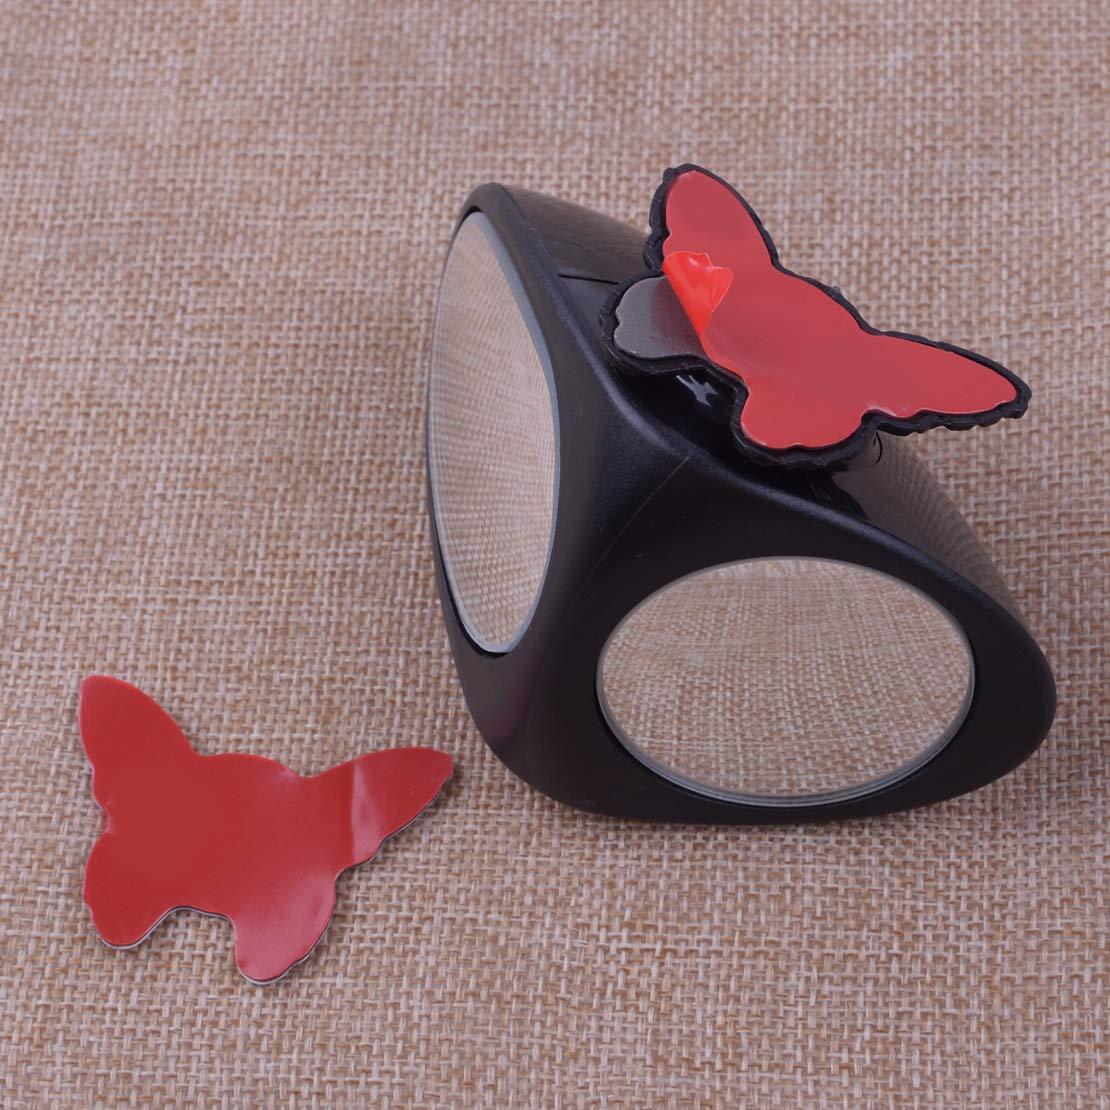 CITALL Pair of Car Blind Spot Mirror Verstellbarer Weitwinkel 360 Rotation Konvexe R/ückansicht f/ür sicheres Parken